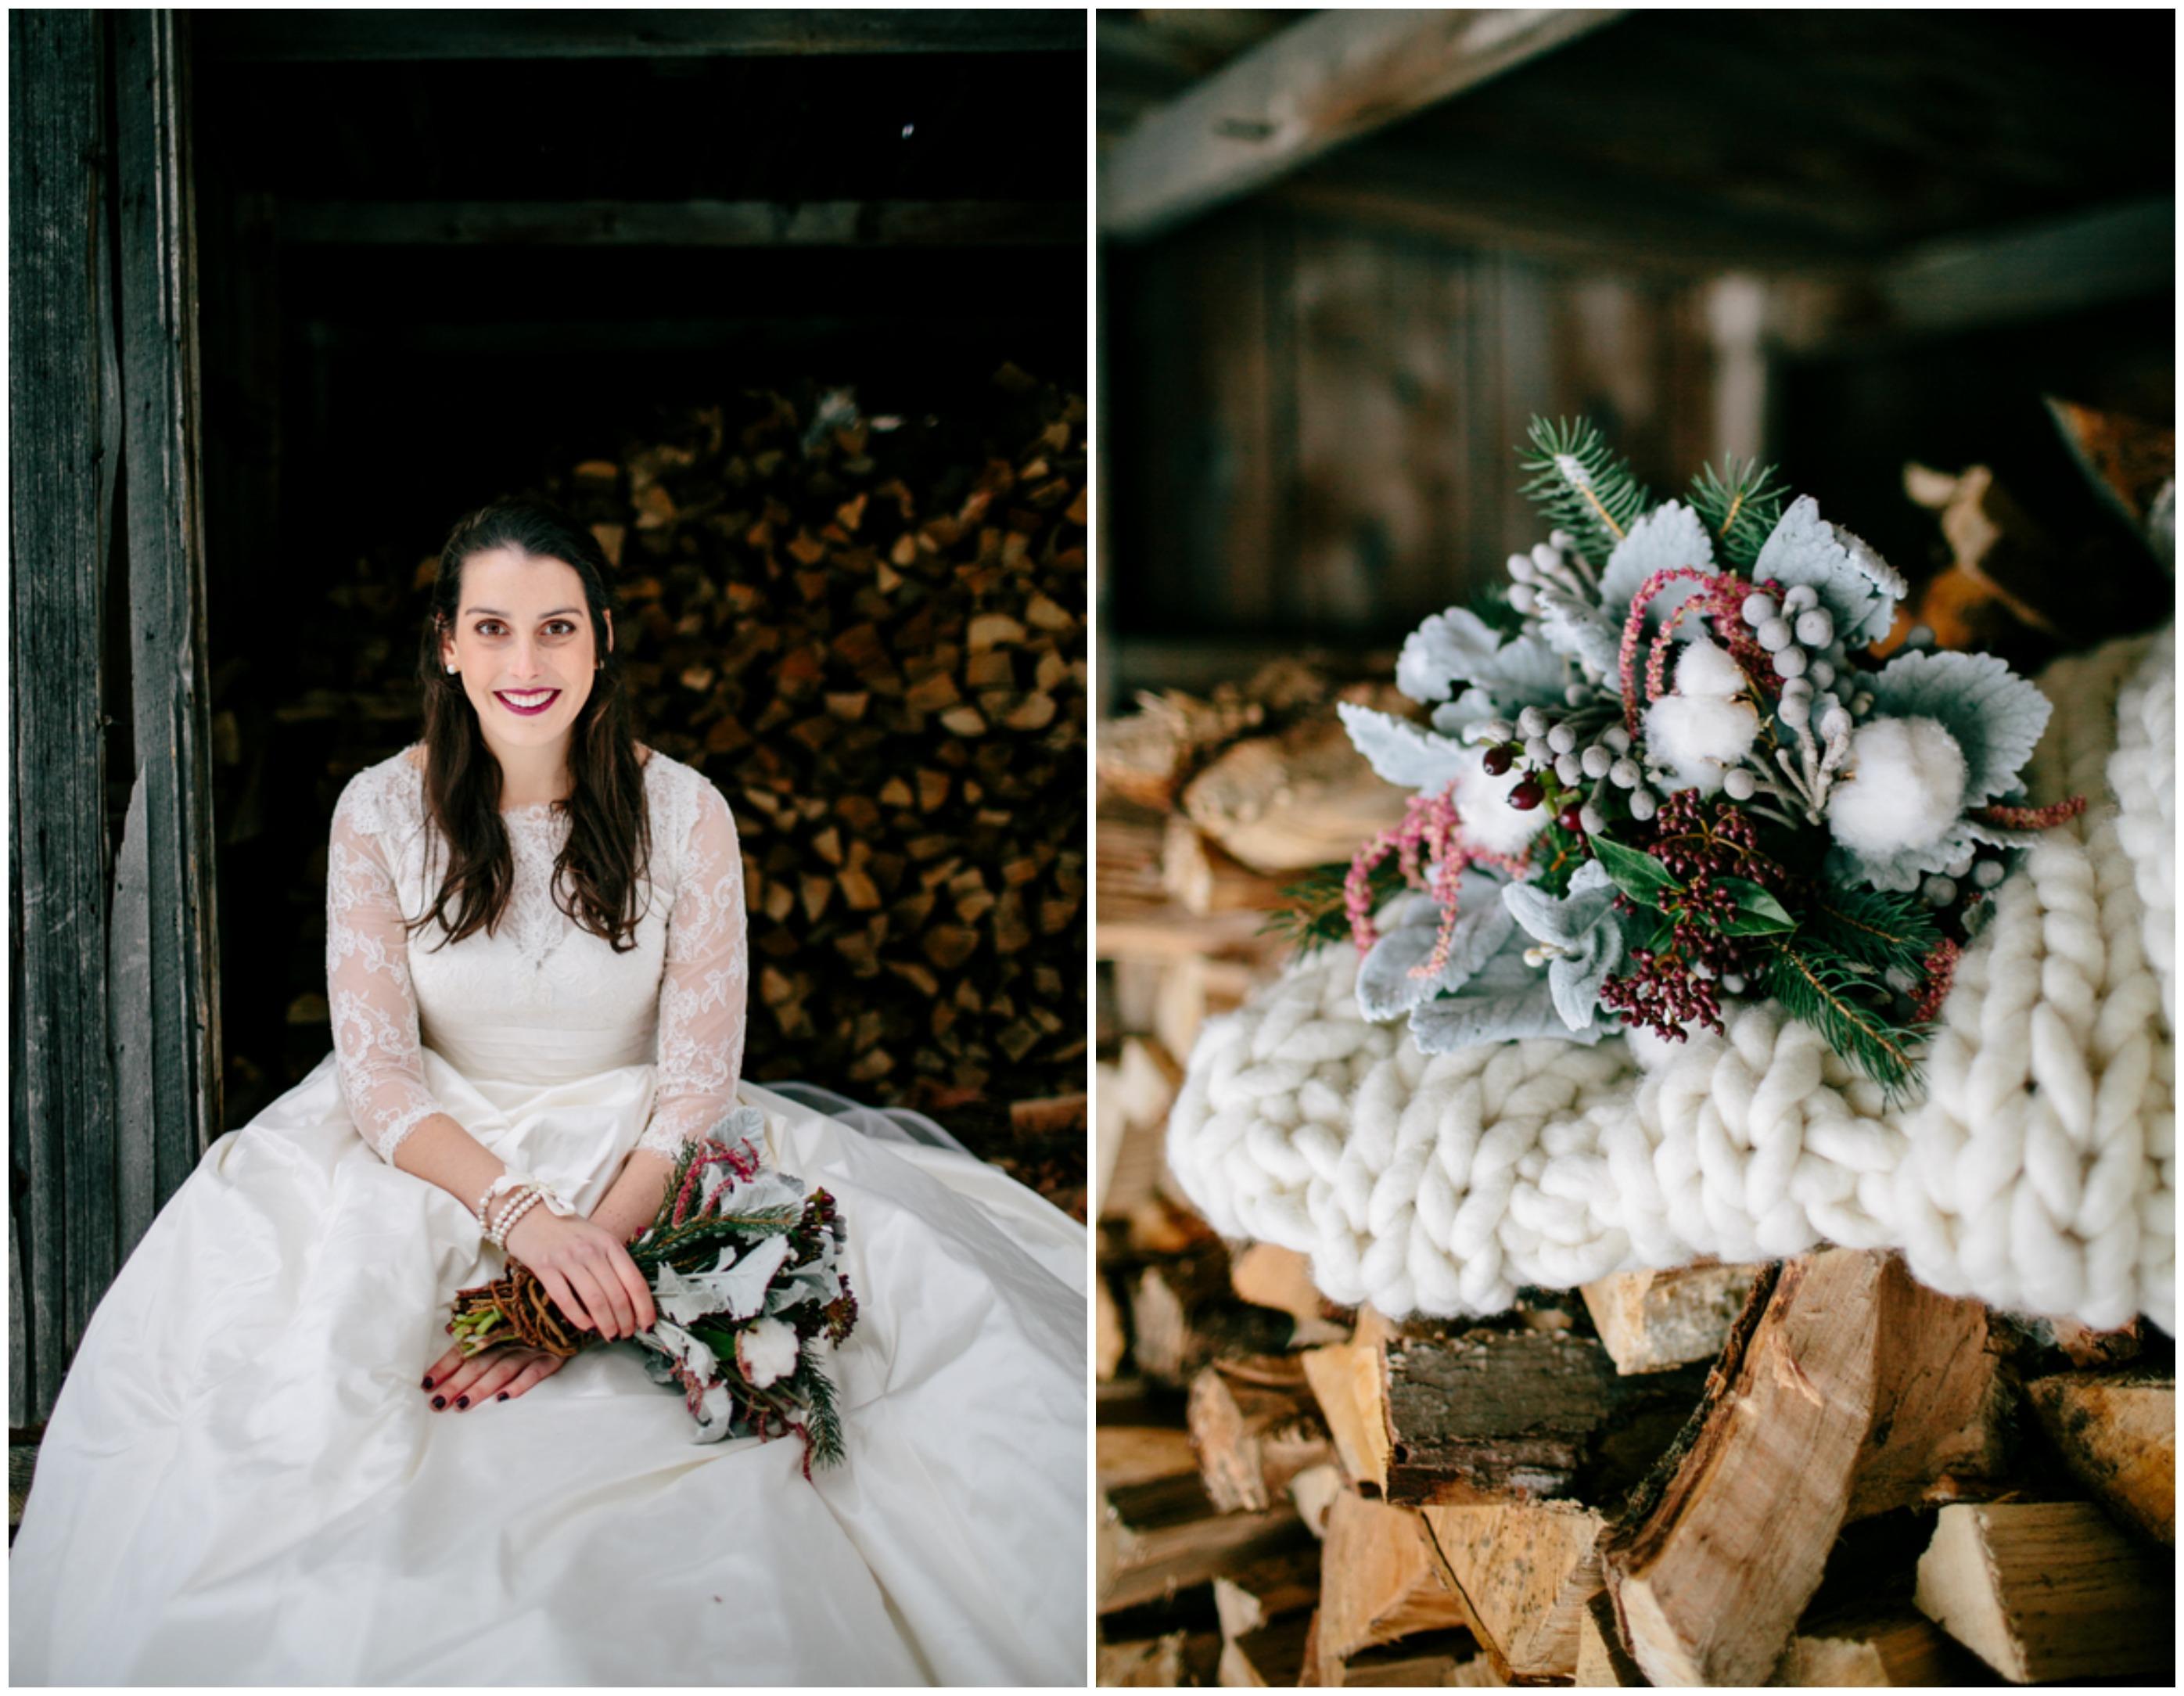 Winter Rustic Wedding Inspiration Rustic Wedding Chic